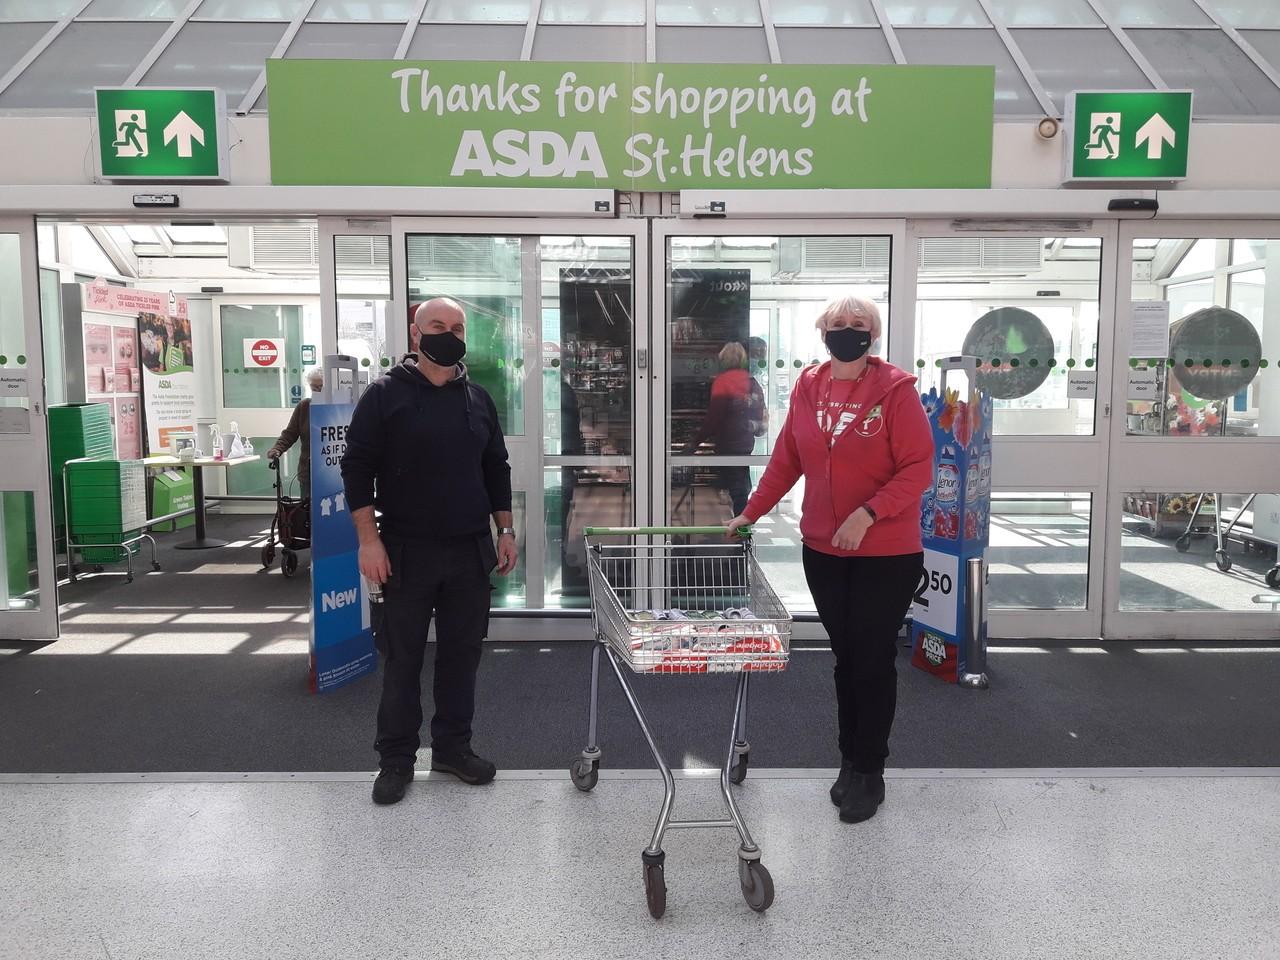 Asda St Helen's donates..... | Asda St Helens